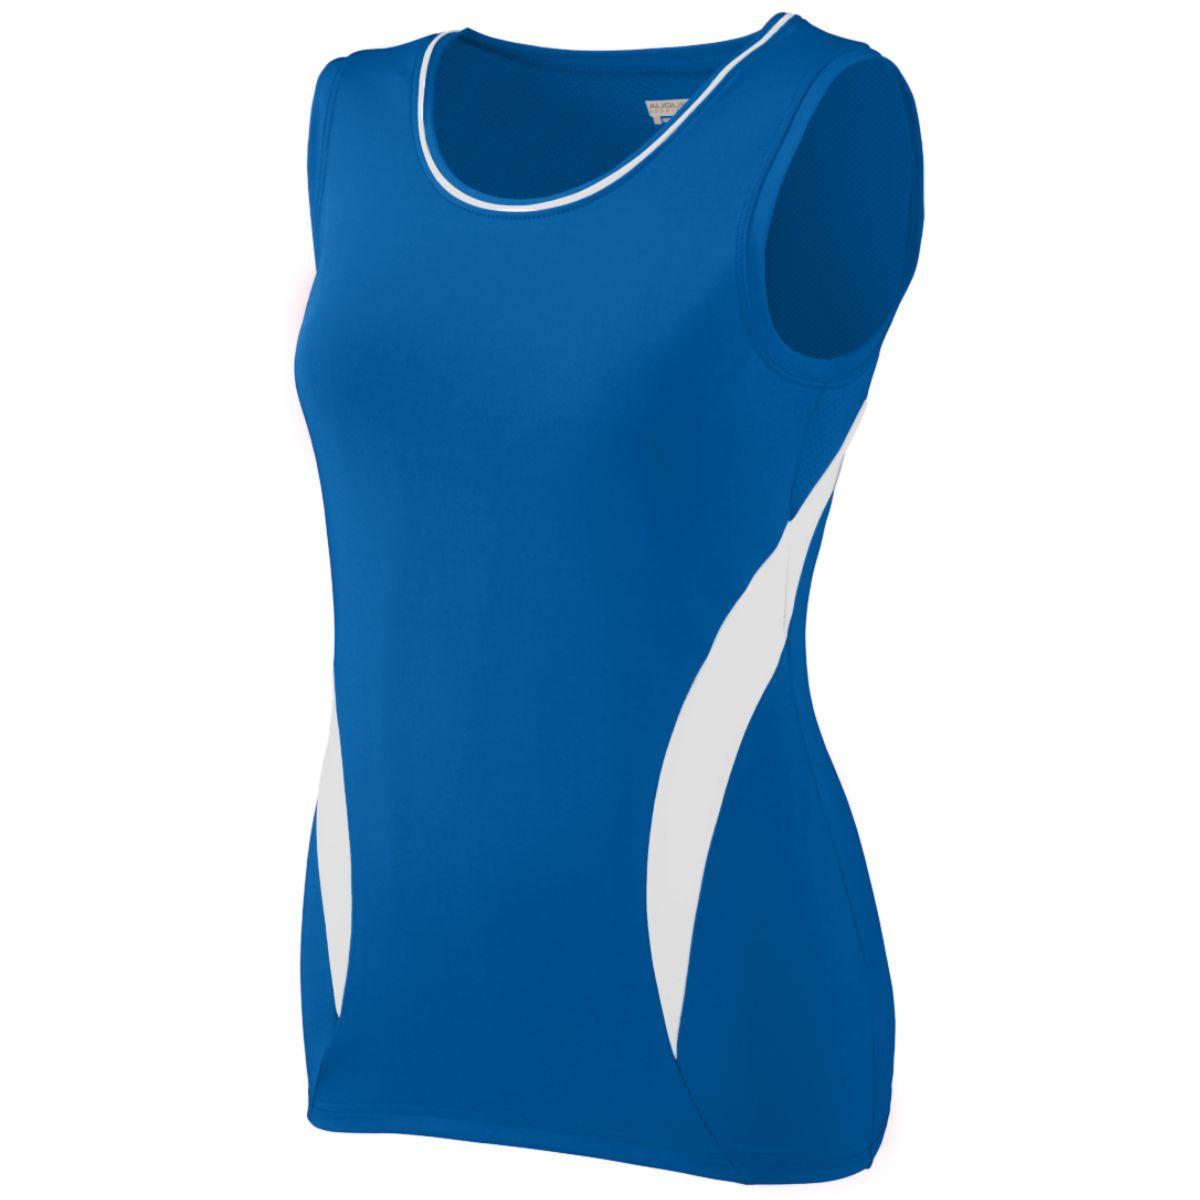 Augusta Sportswear Women's Motivator Jersey M Royal/White